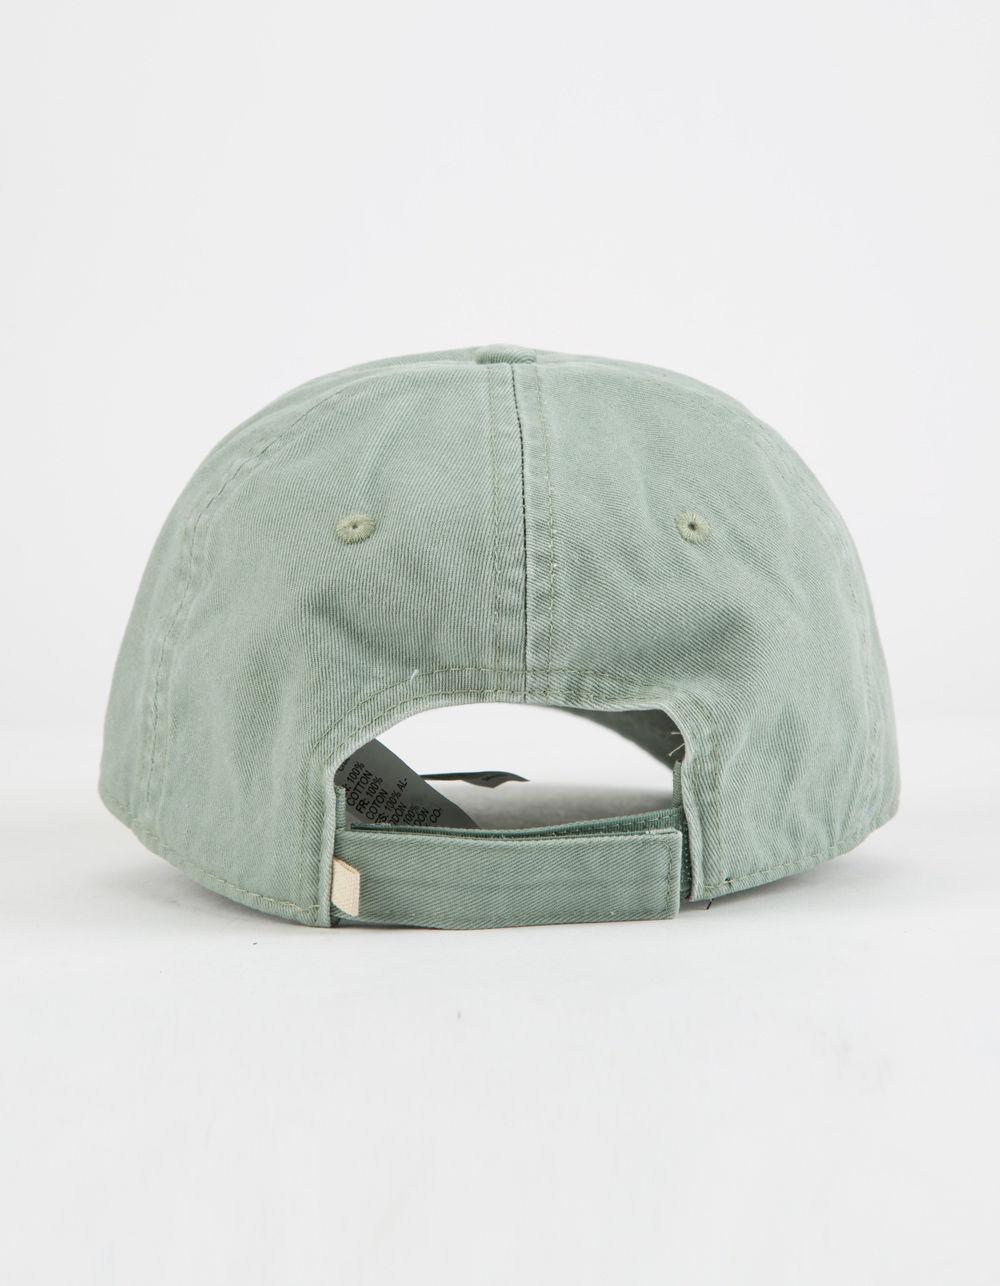 76658067ad5 Lyst - Roxy Dear Believer Olive Womens Dad Hat in Green for Men